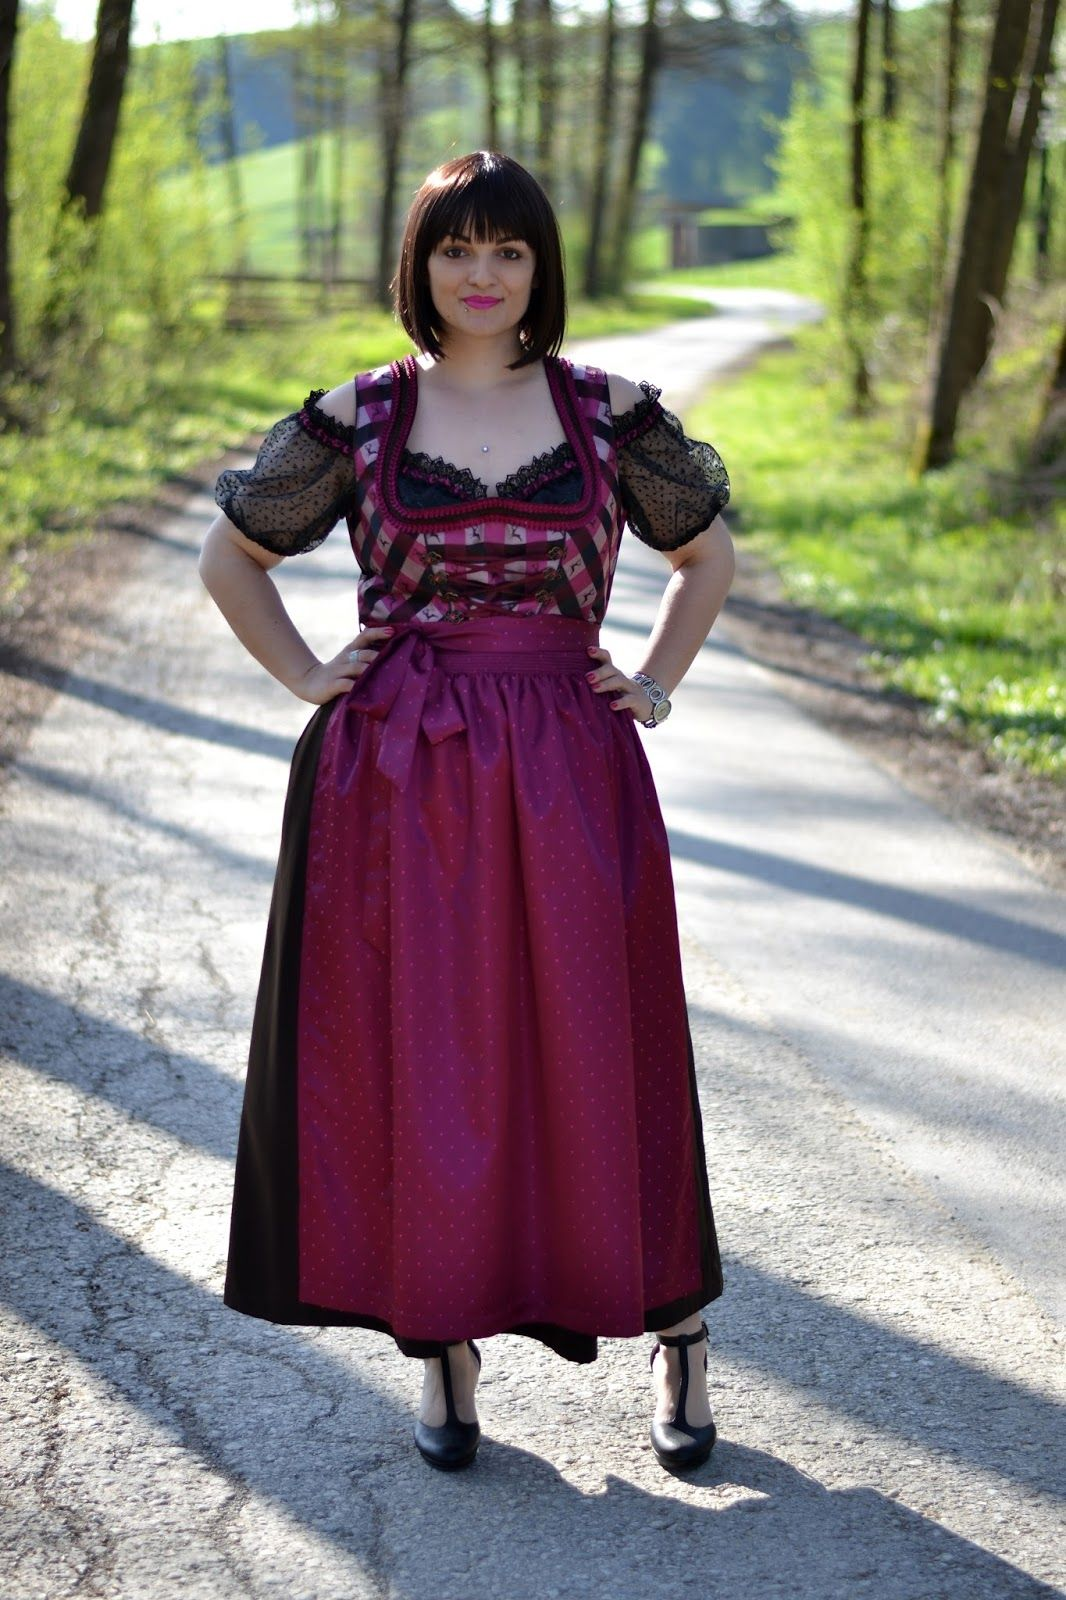 German Plus Size Fashion Curvy Claudia: Mei naigs Dirndl! | costumes ...